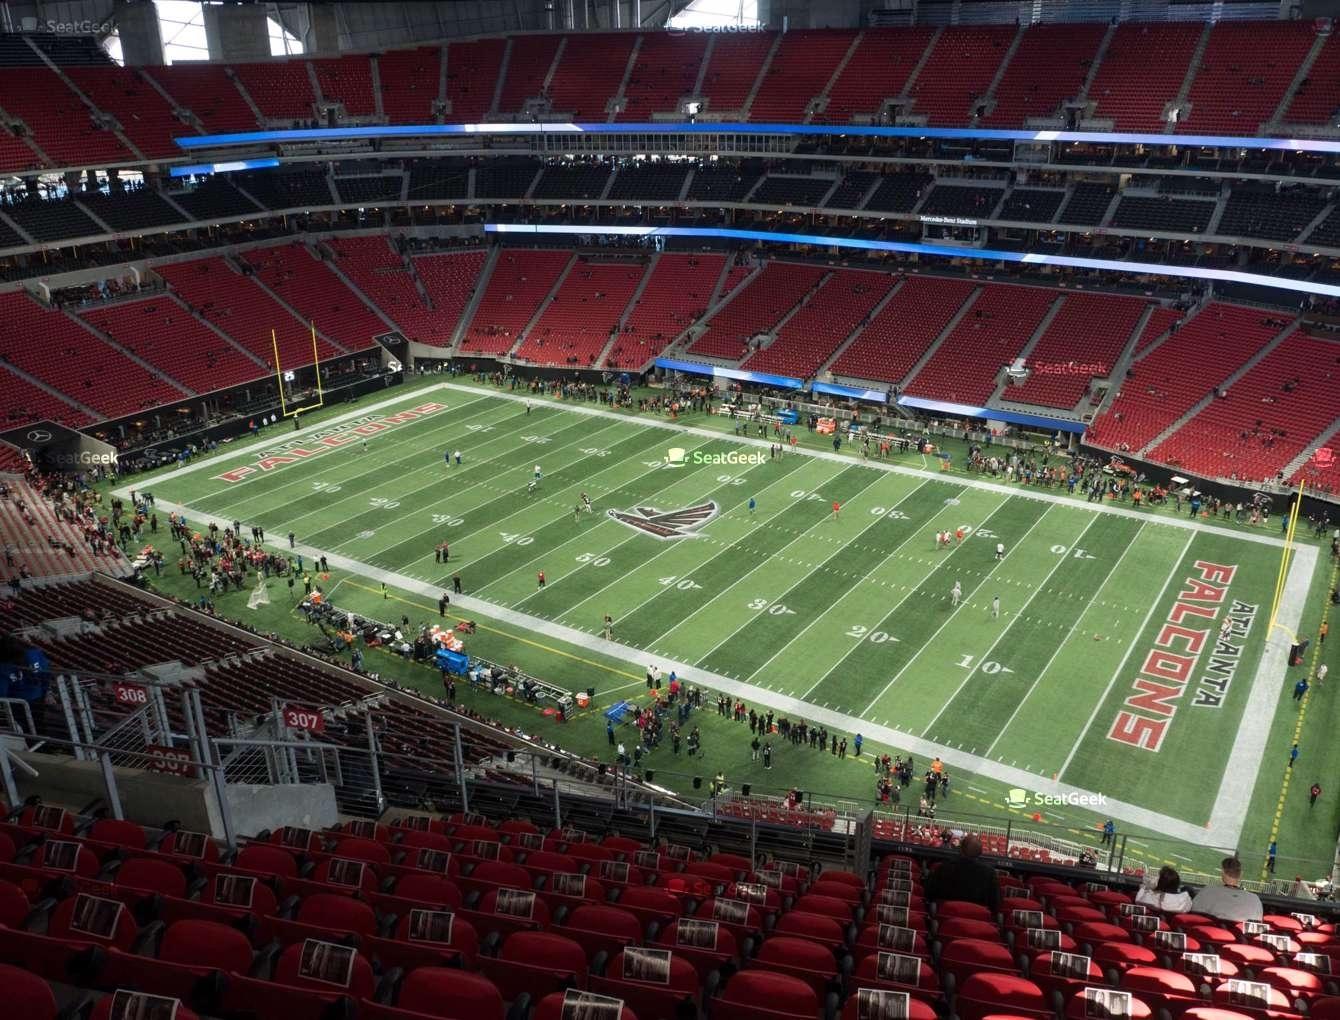 Mercedes-Benz Stadium Section 307 Seat Views | Seatgeek intended for Atlanta Stadium Super Bowl Seating